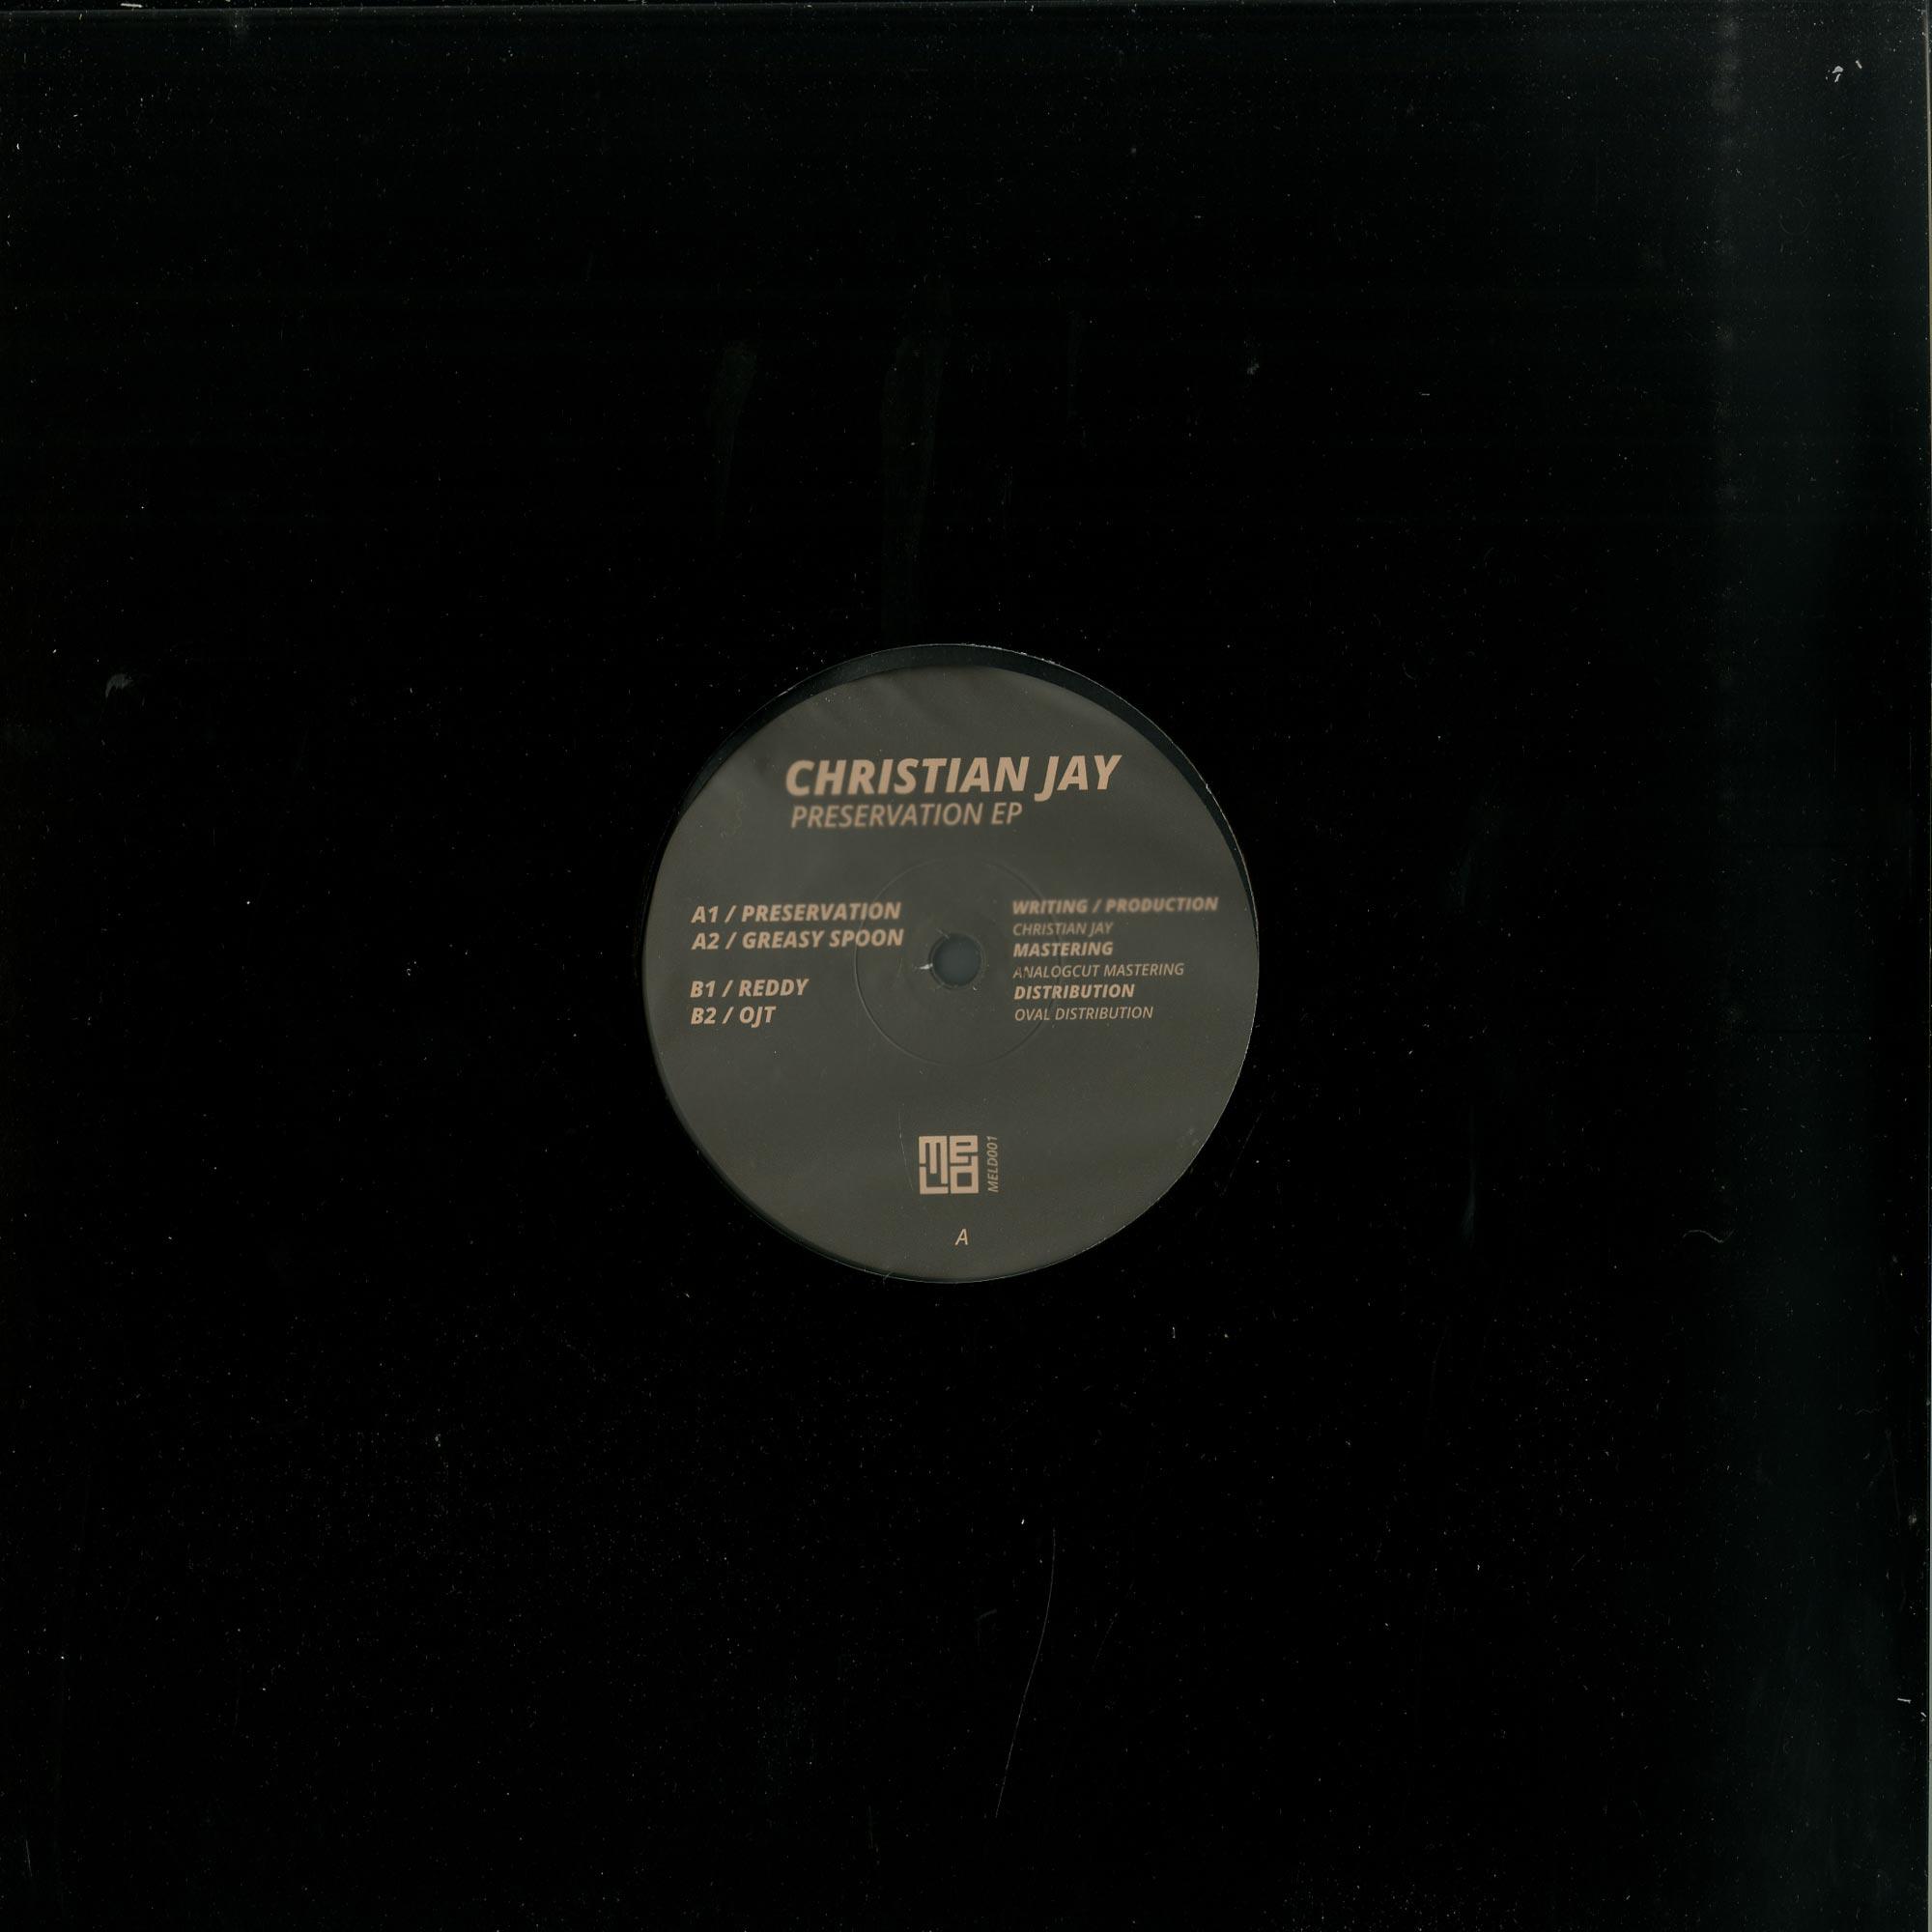 Christian Jay - PRESERVATION EP